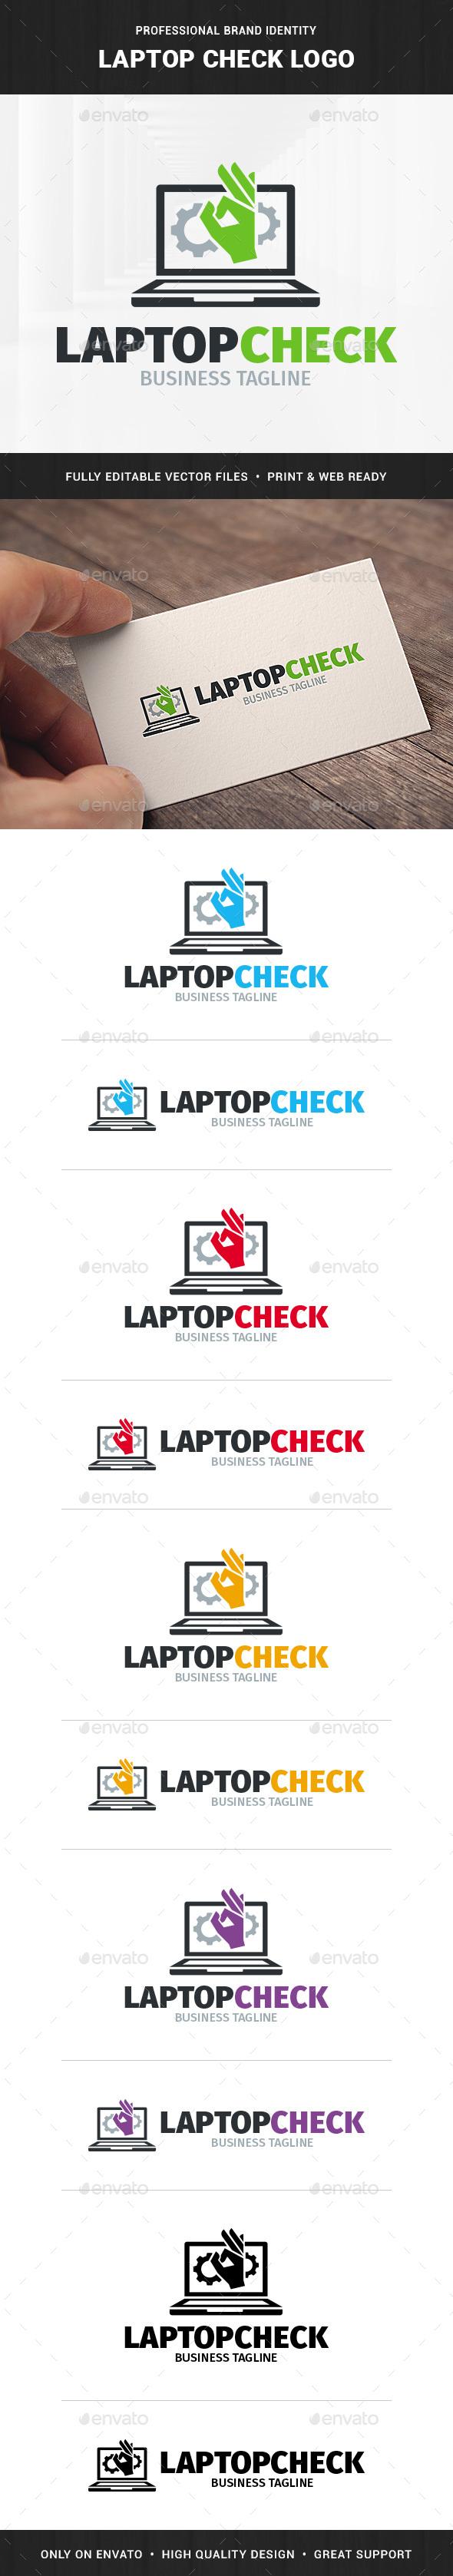 Laptop Check Logo Template